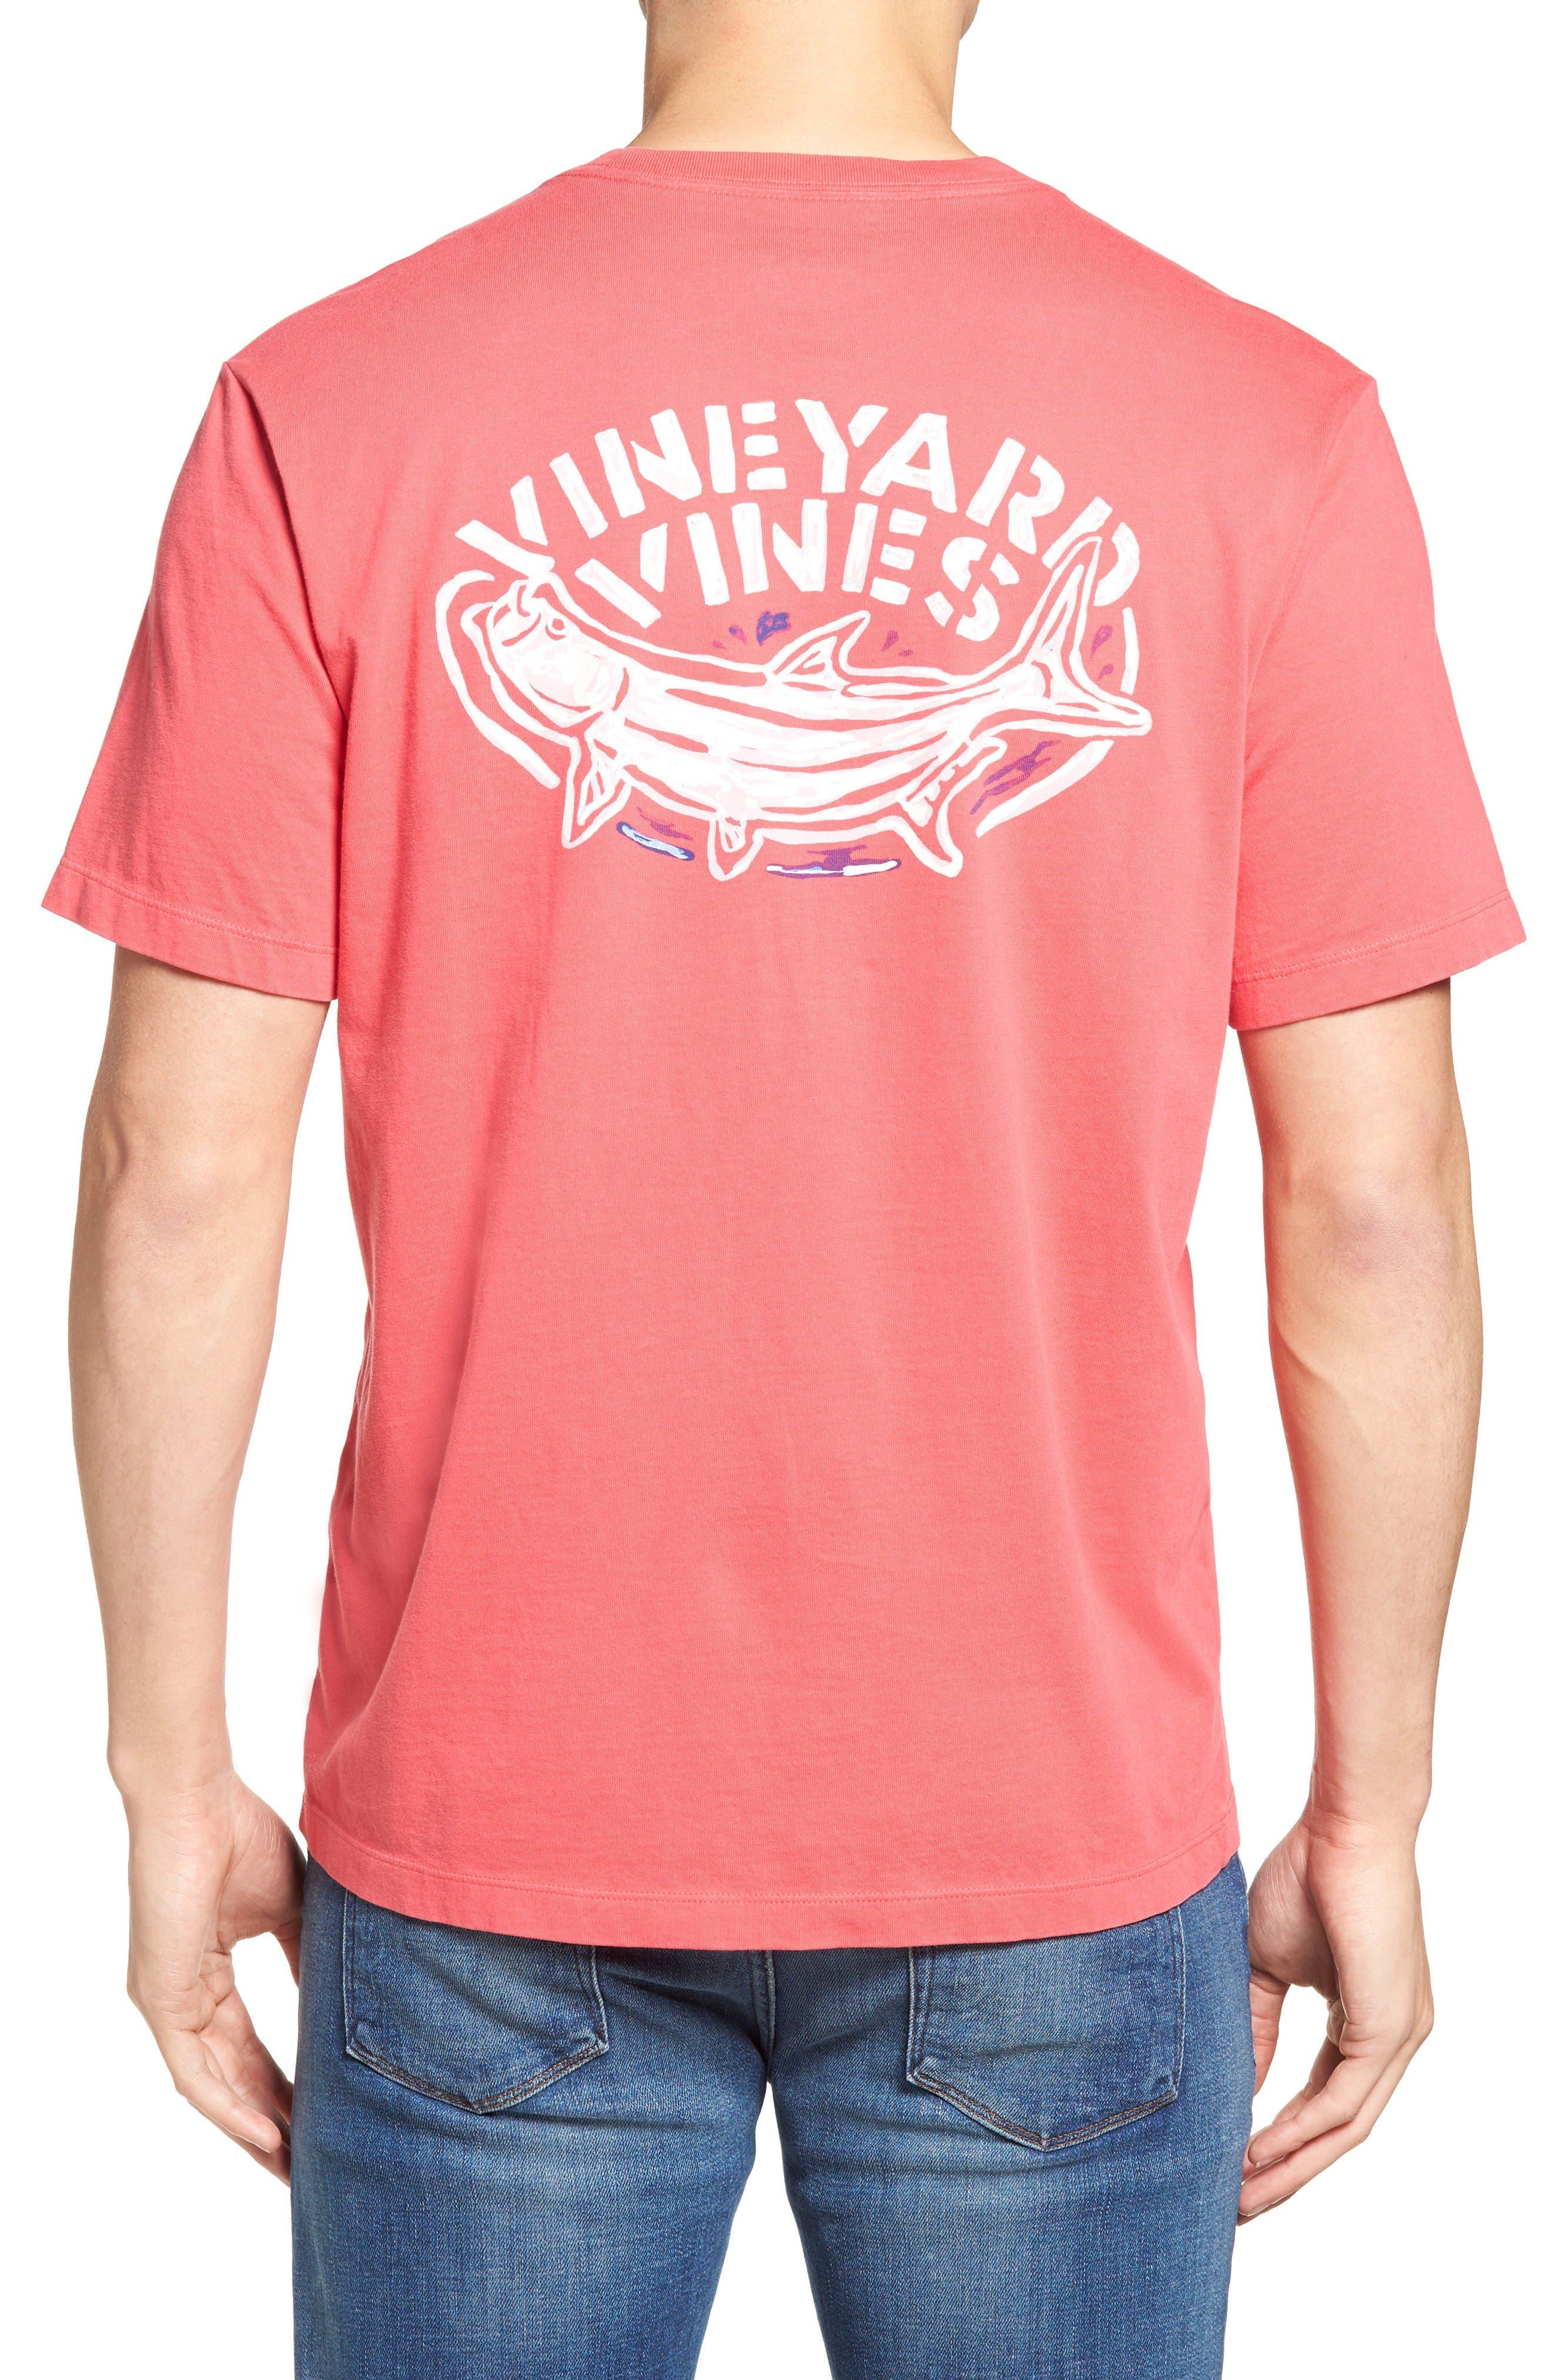 Main Image - Vineyard Vines Stencil Tarpon Graphic Pocket T-Shirt